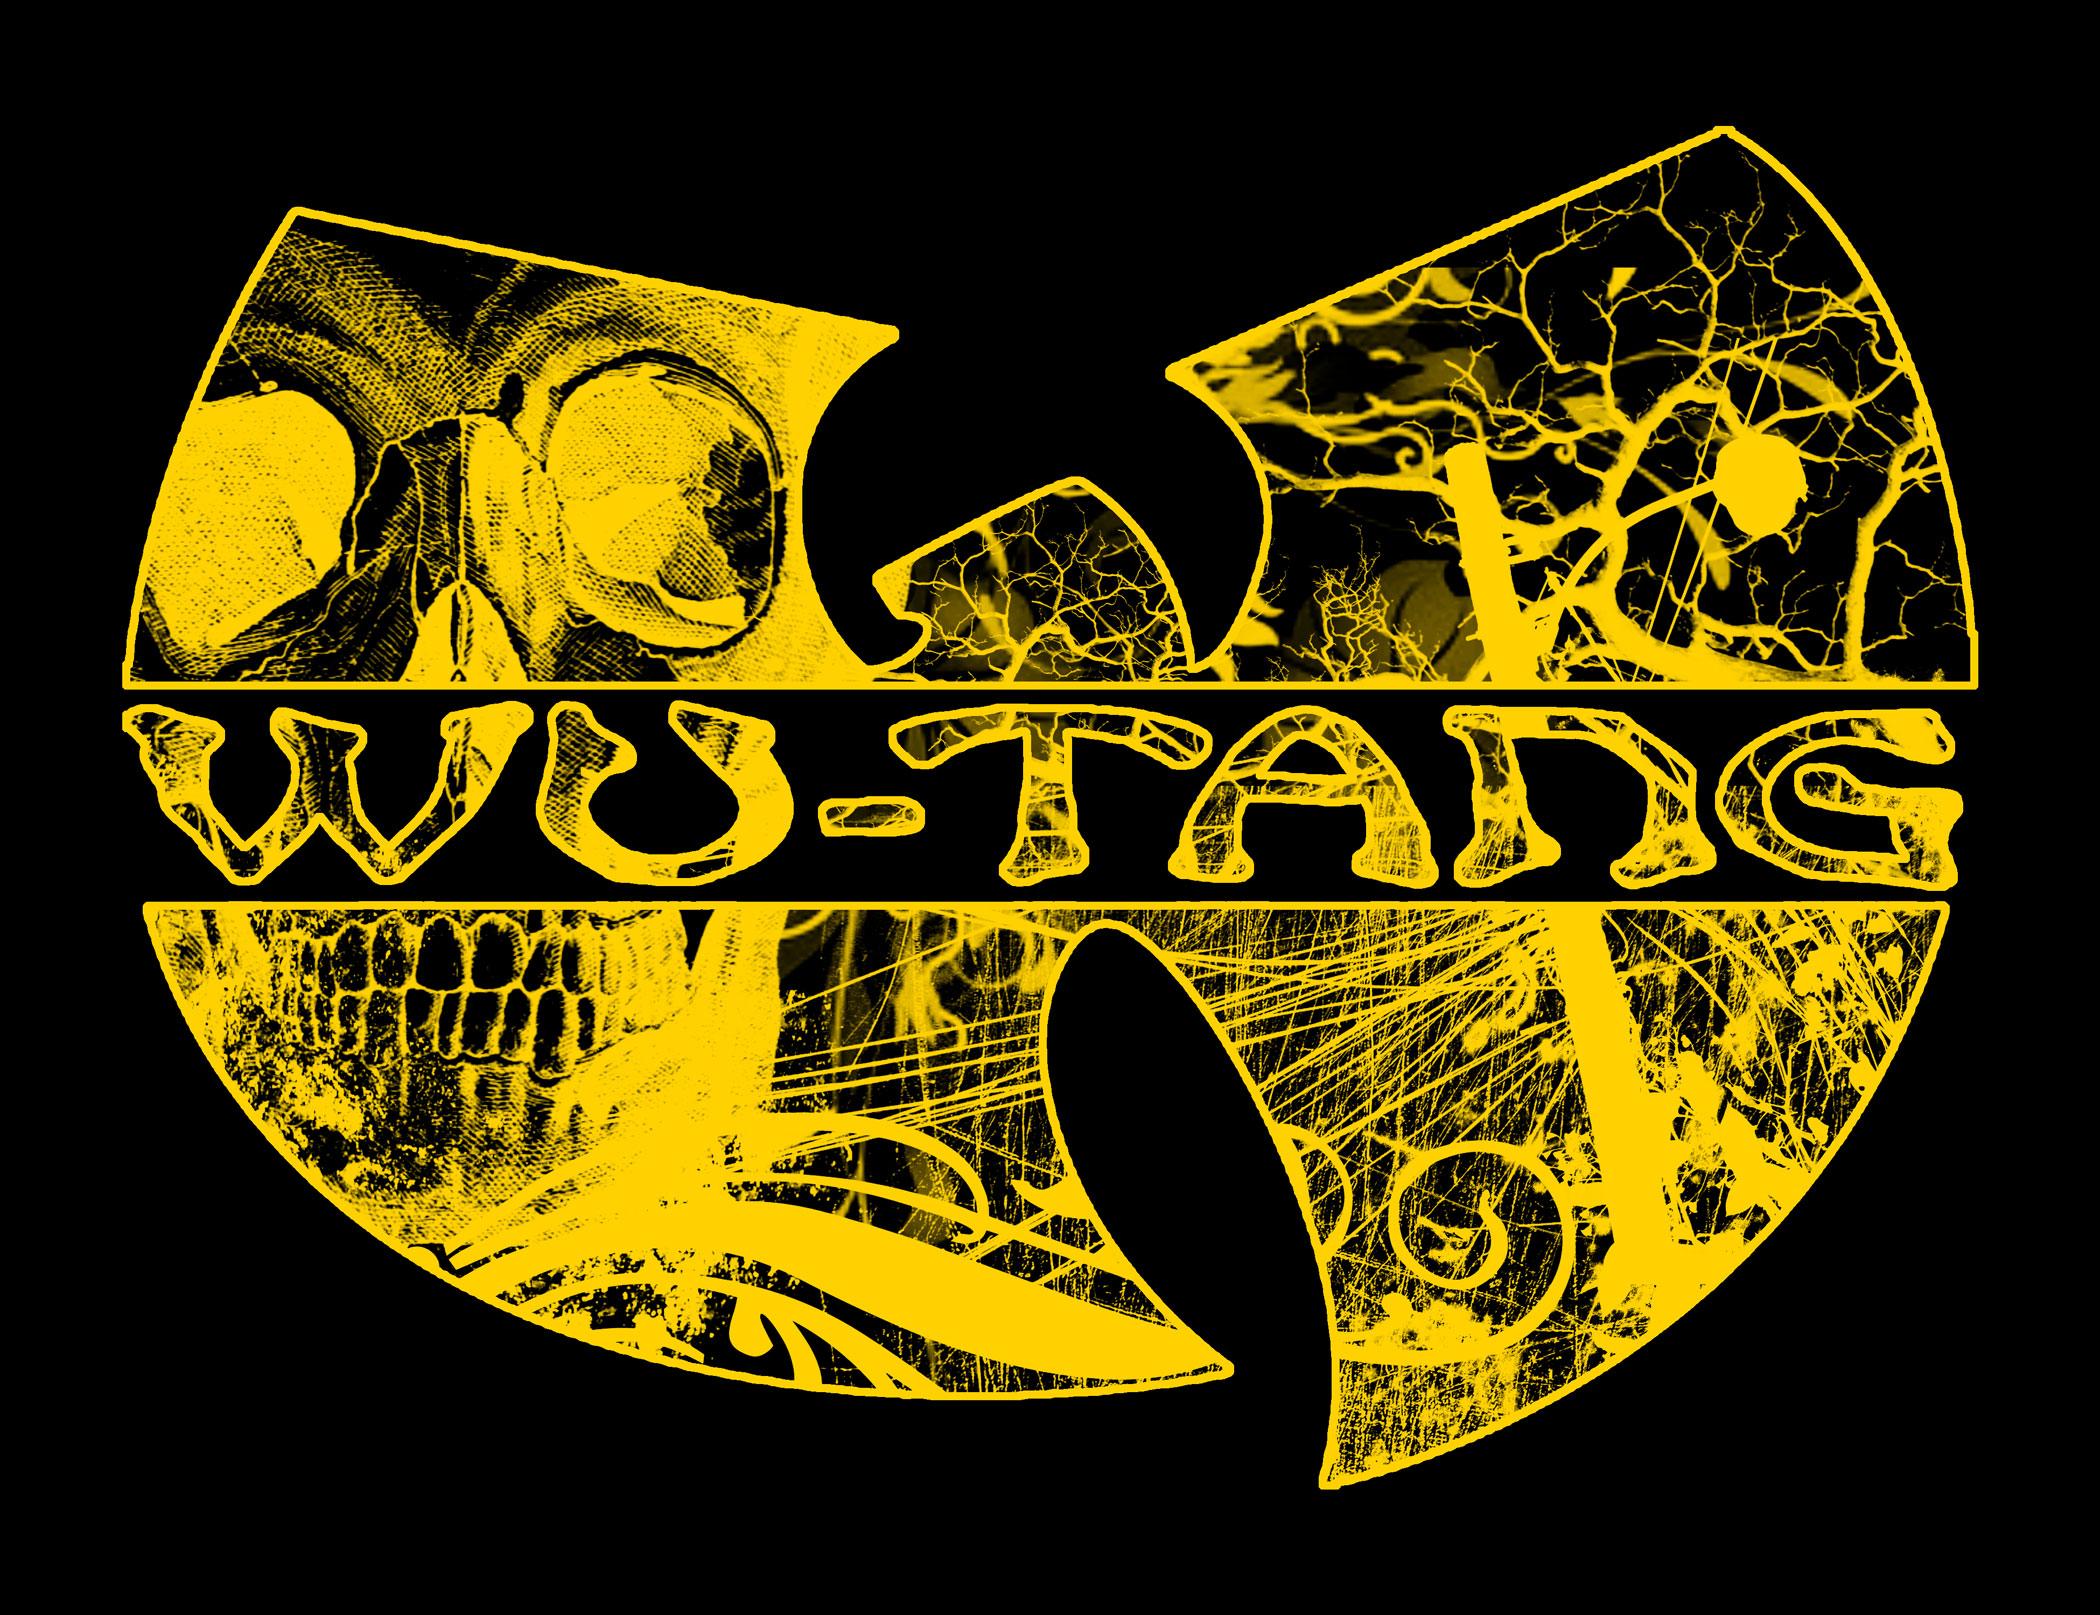 Wu Tang Clan gangsta rap hip hop g wallpaper 2100x1615 91649 2100x1615